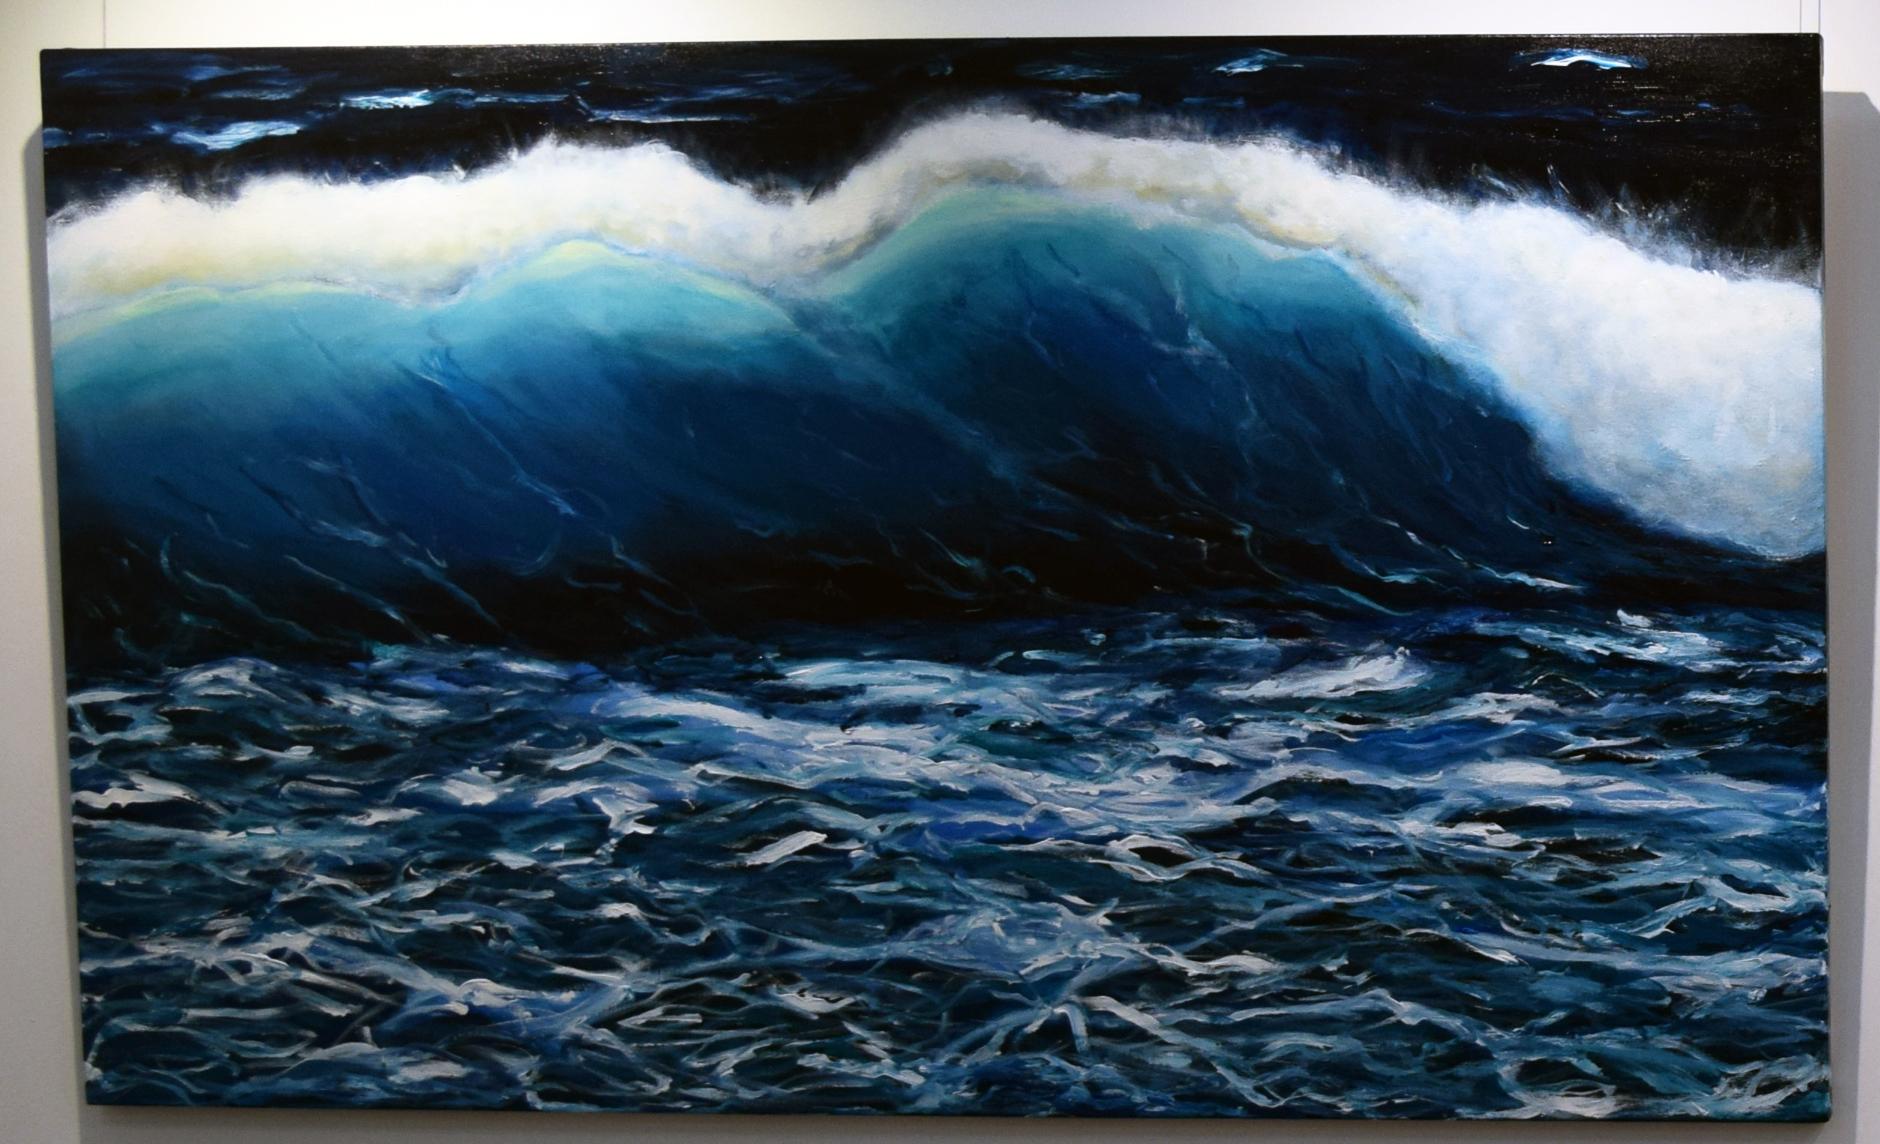 4. Jenny McGrath, Tempestuous, 2018, acrylic on canvas, 90 x 150 cm, $1,480